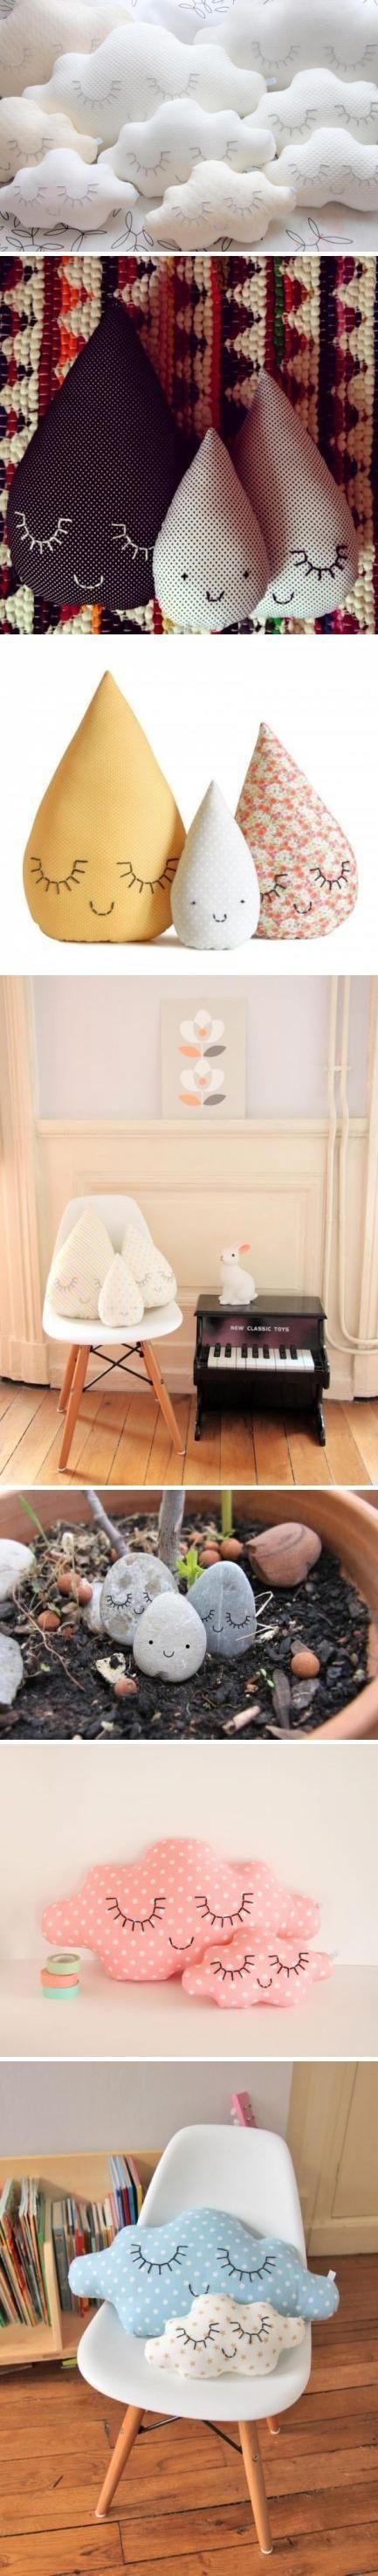 Make your own teardrop pillow | Source: http://www.duitang.com/people/mblog/72870315/detail/